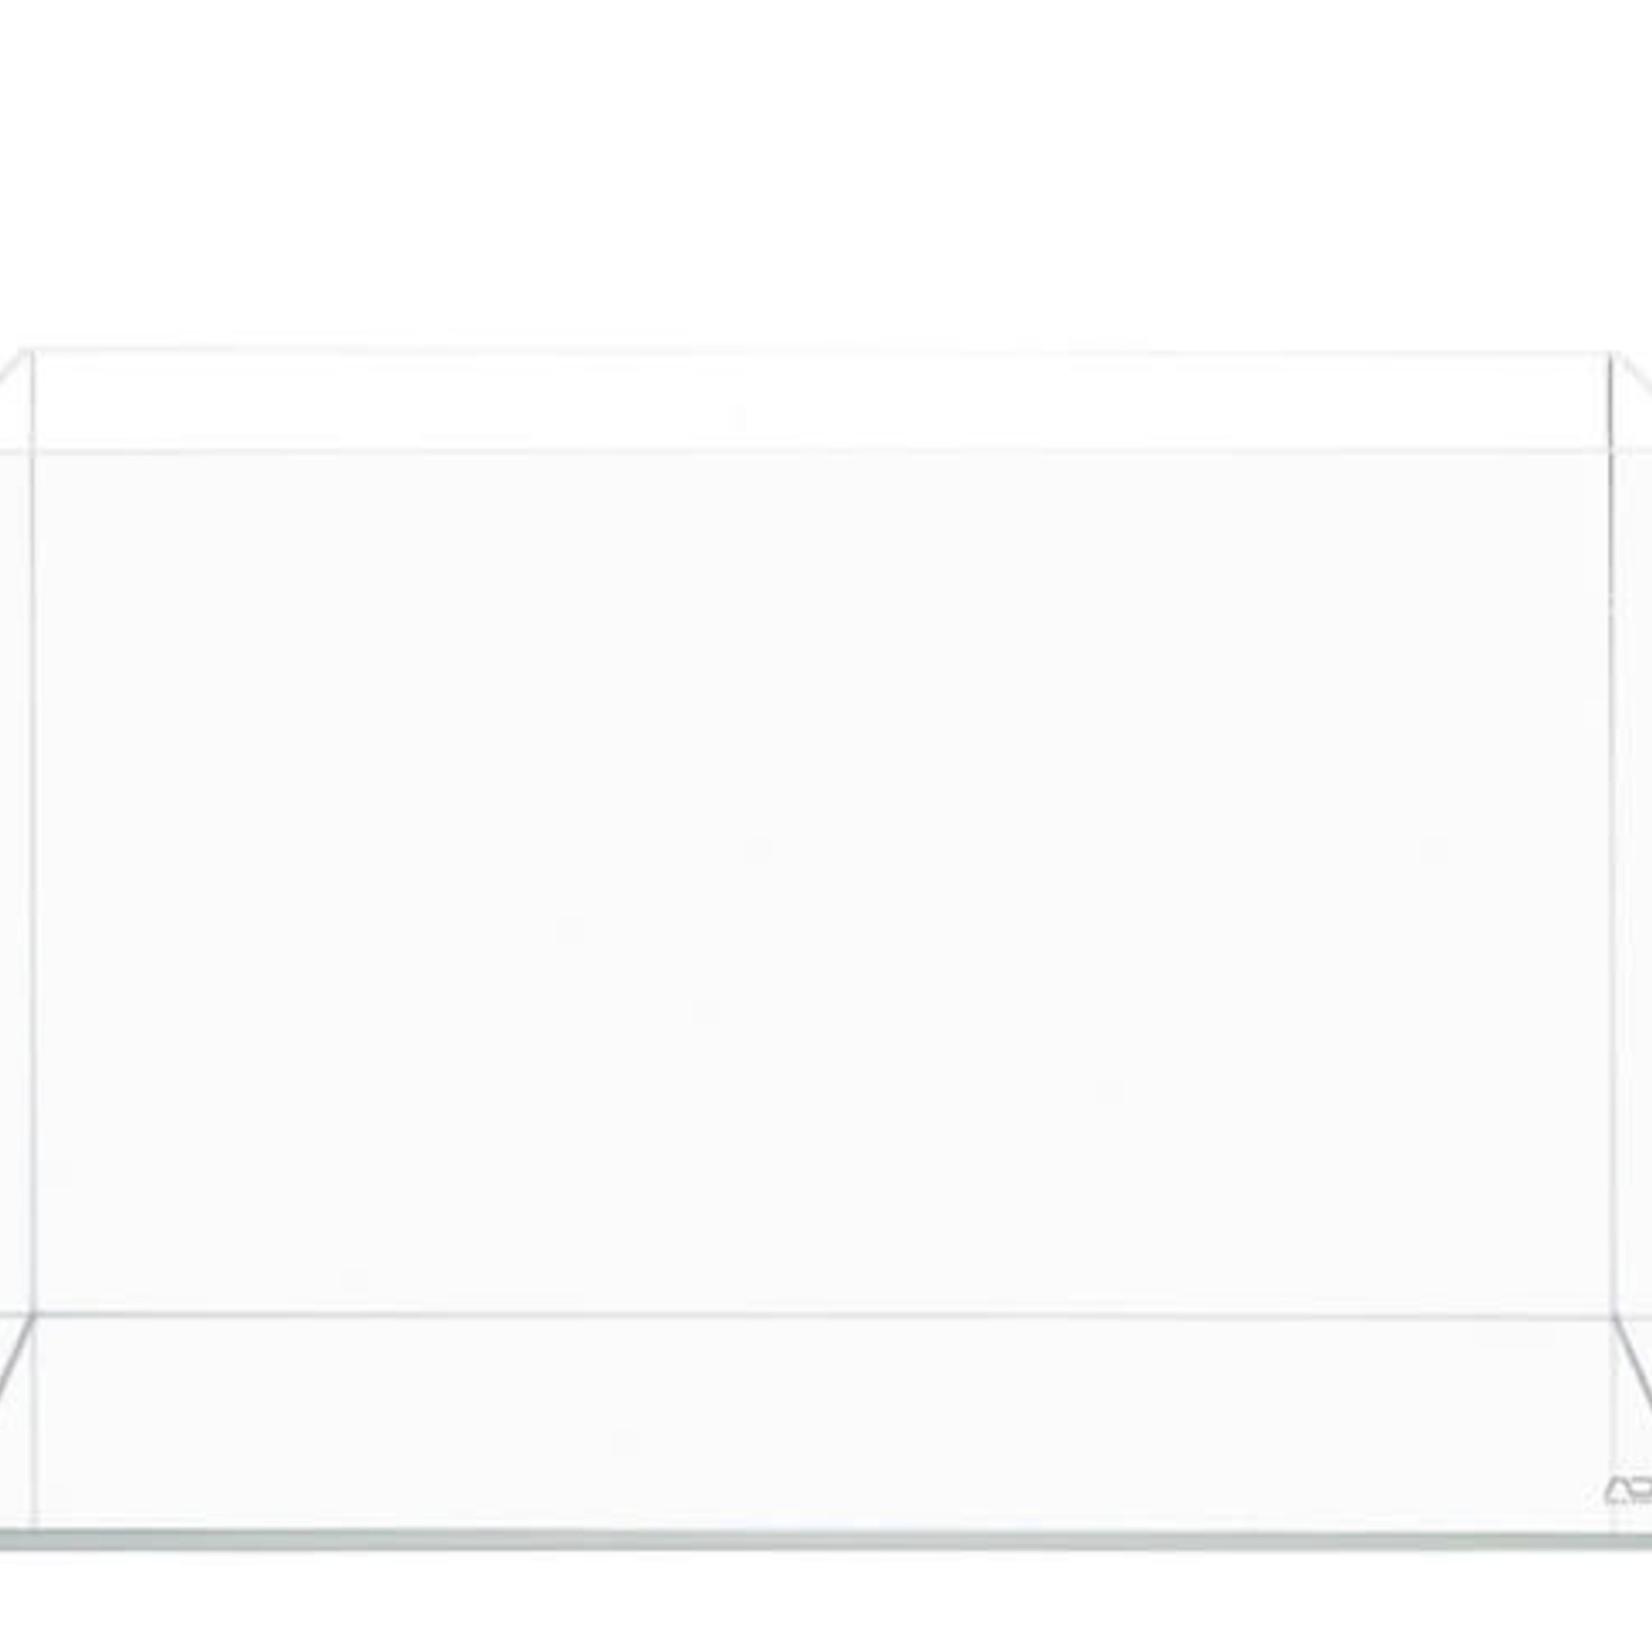 ADA Cube Garden Mini S (30x18x24cm/5mm) incl.4 hooks